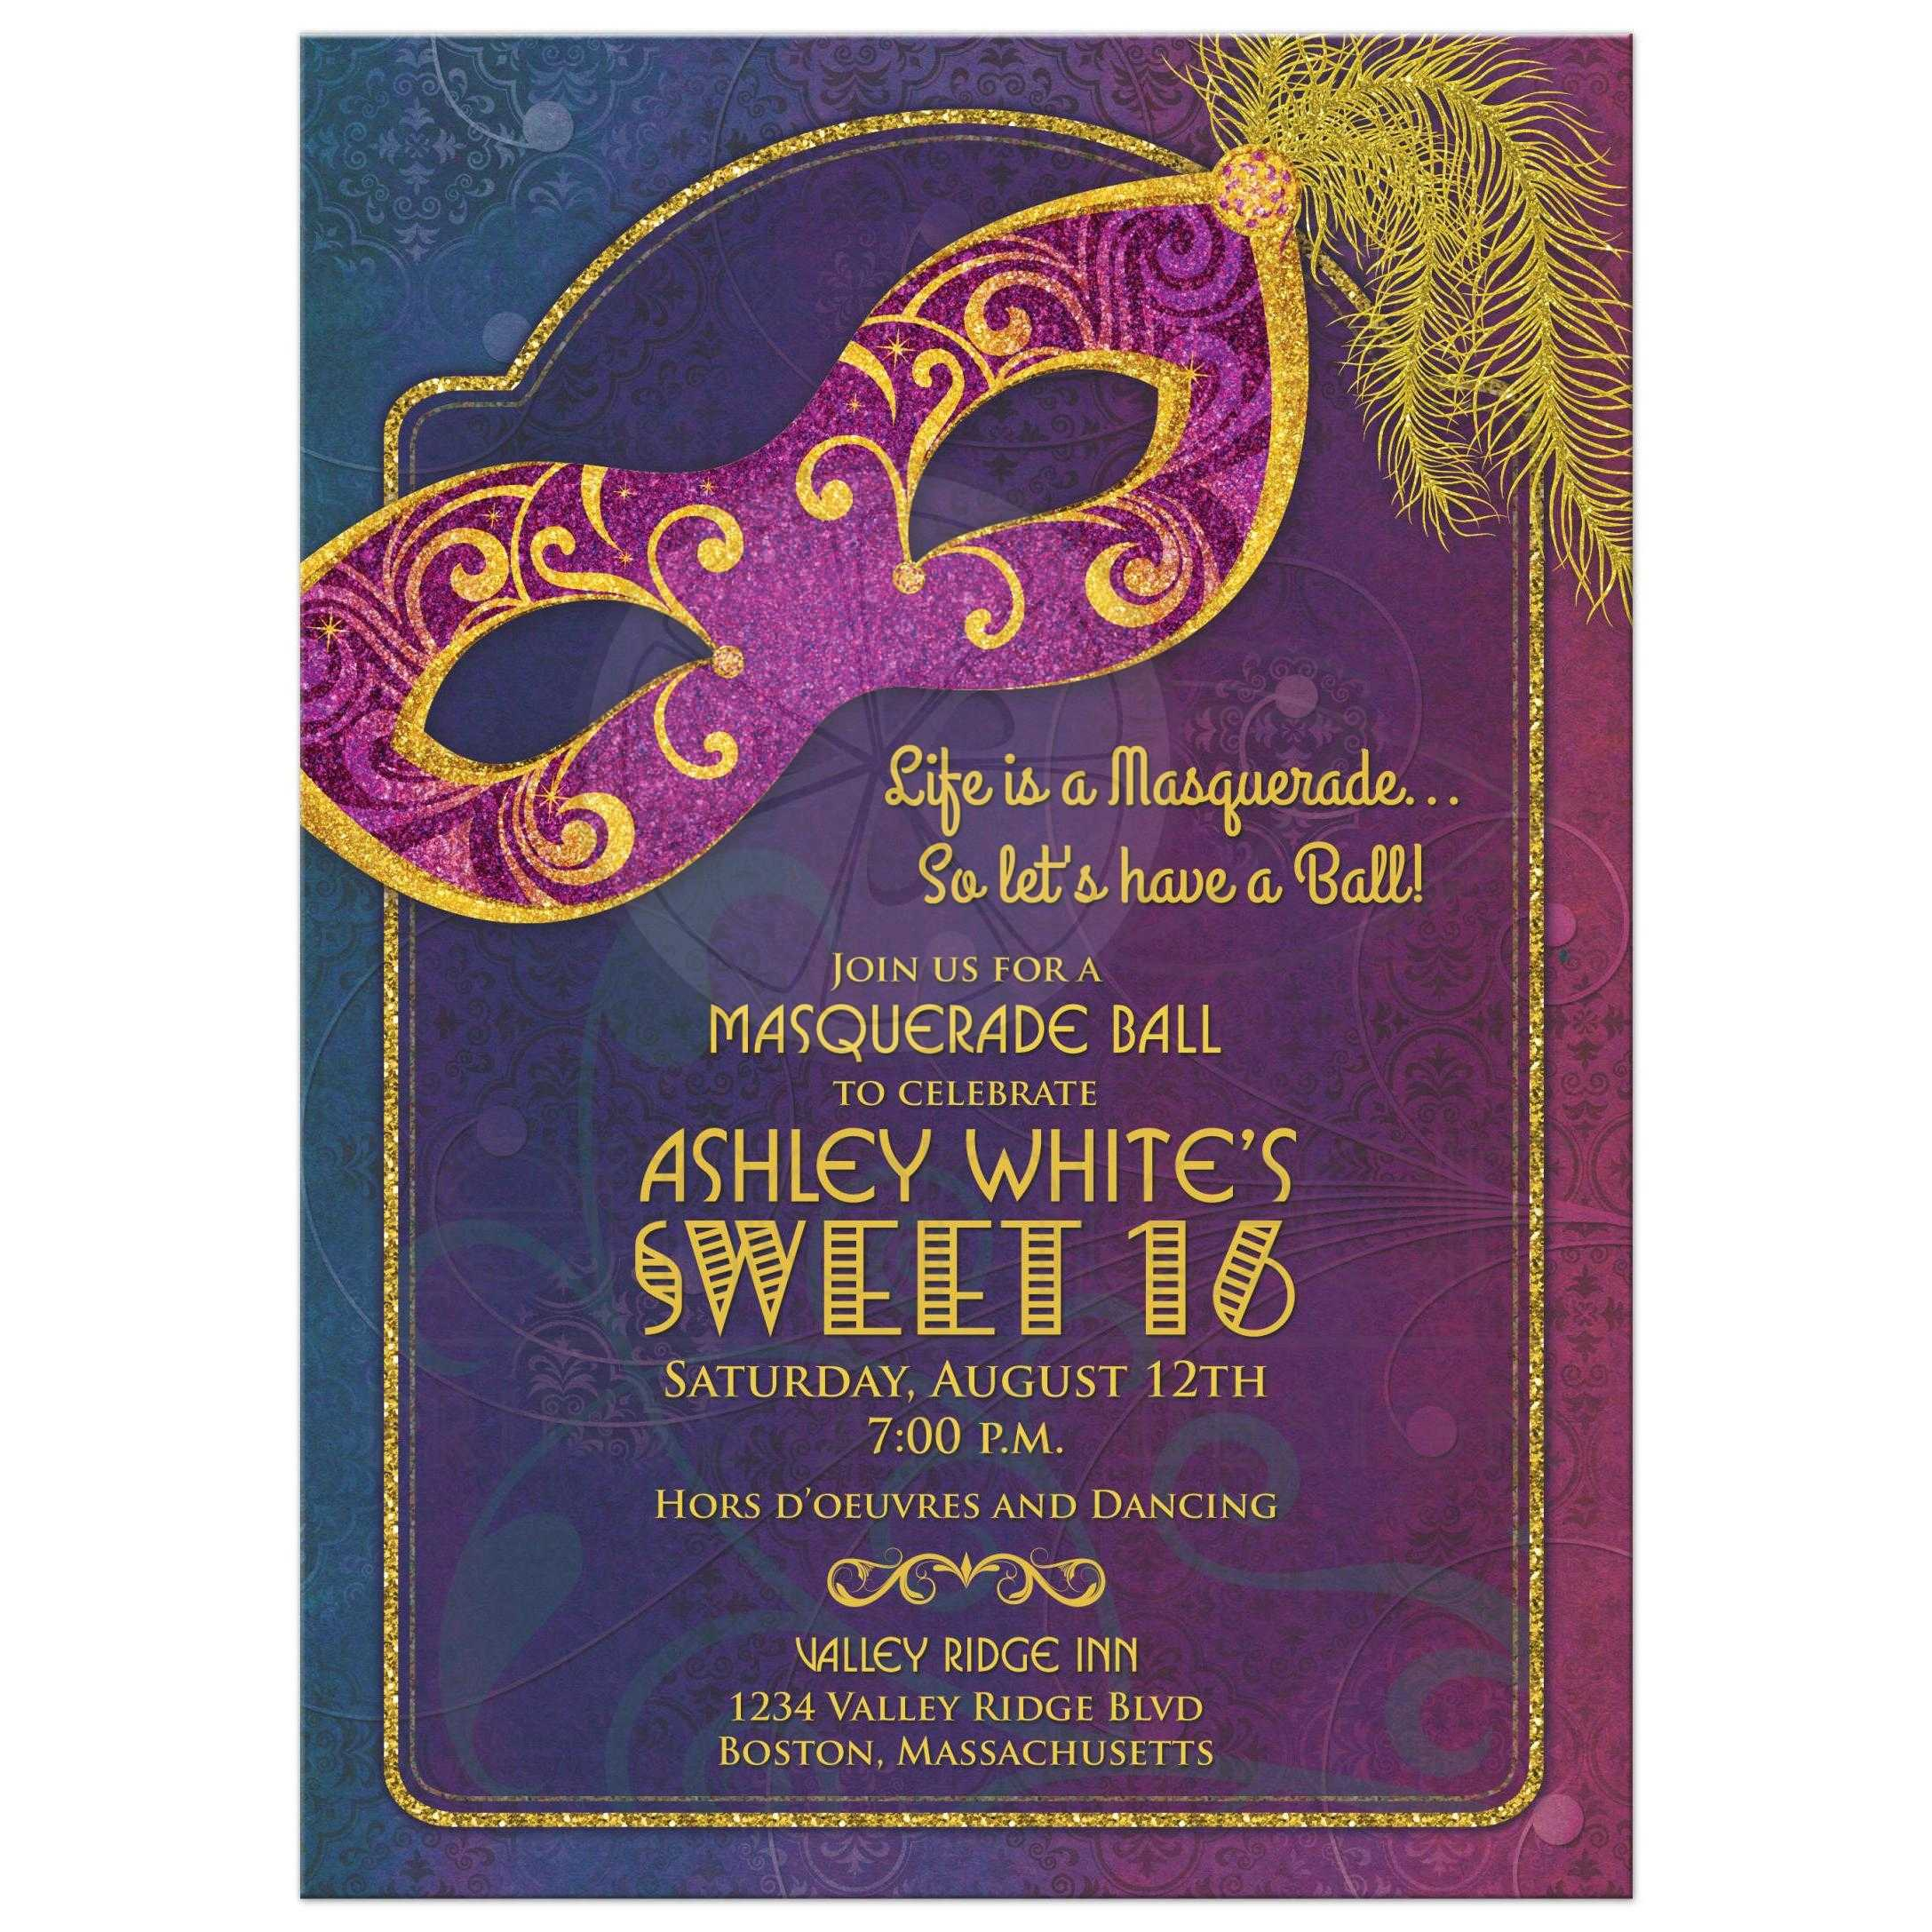 Masquerade Ball Sweet 16 Invitation | Jewel Tones and Gold Mask